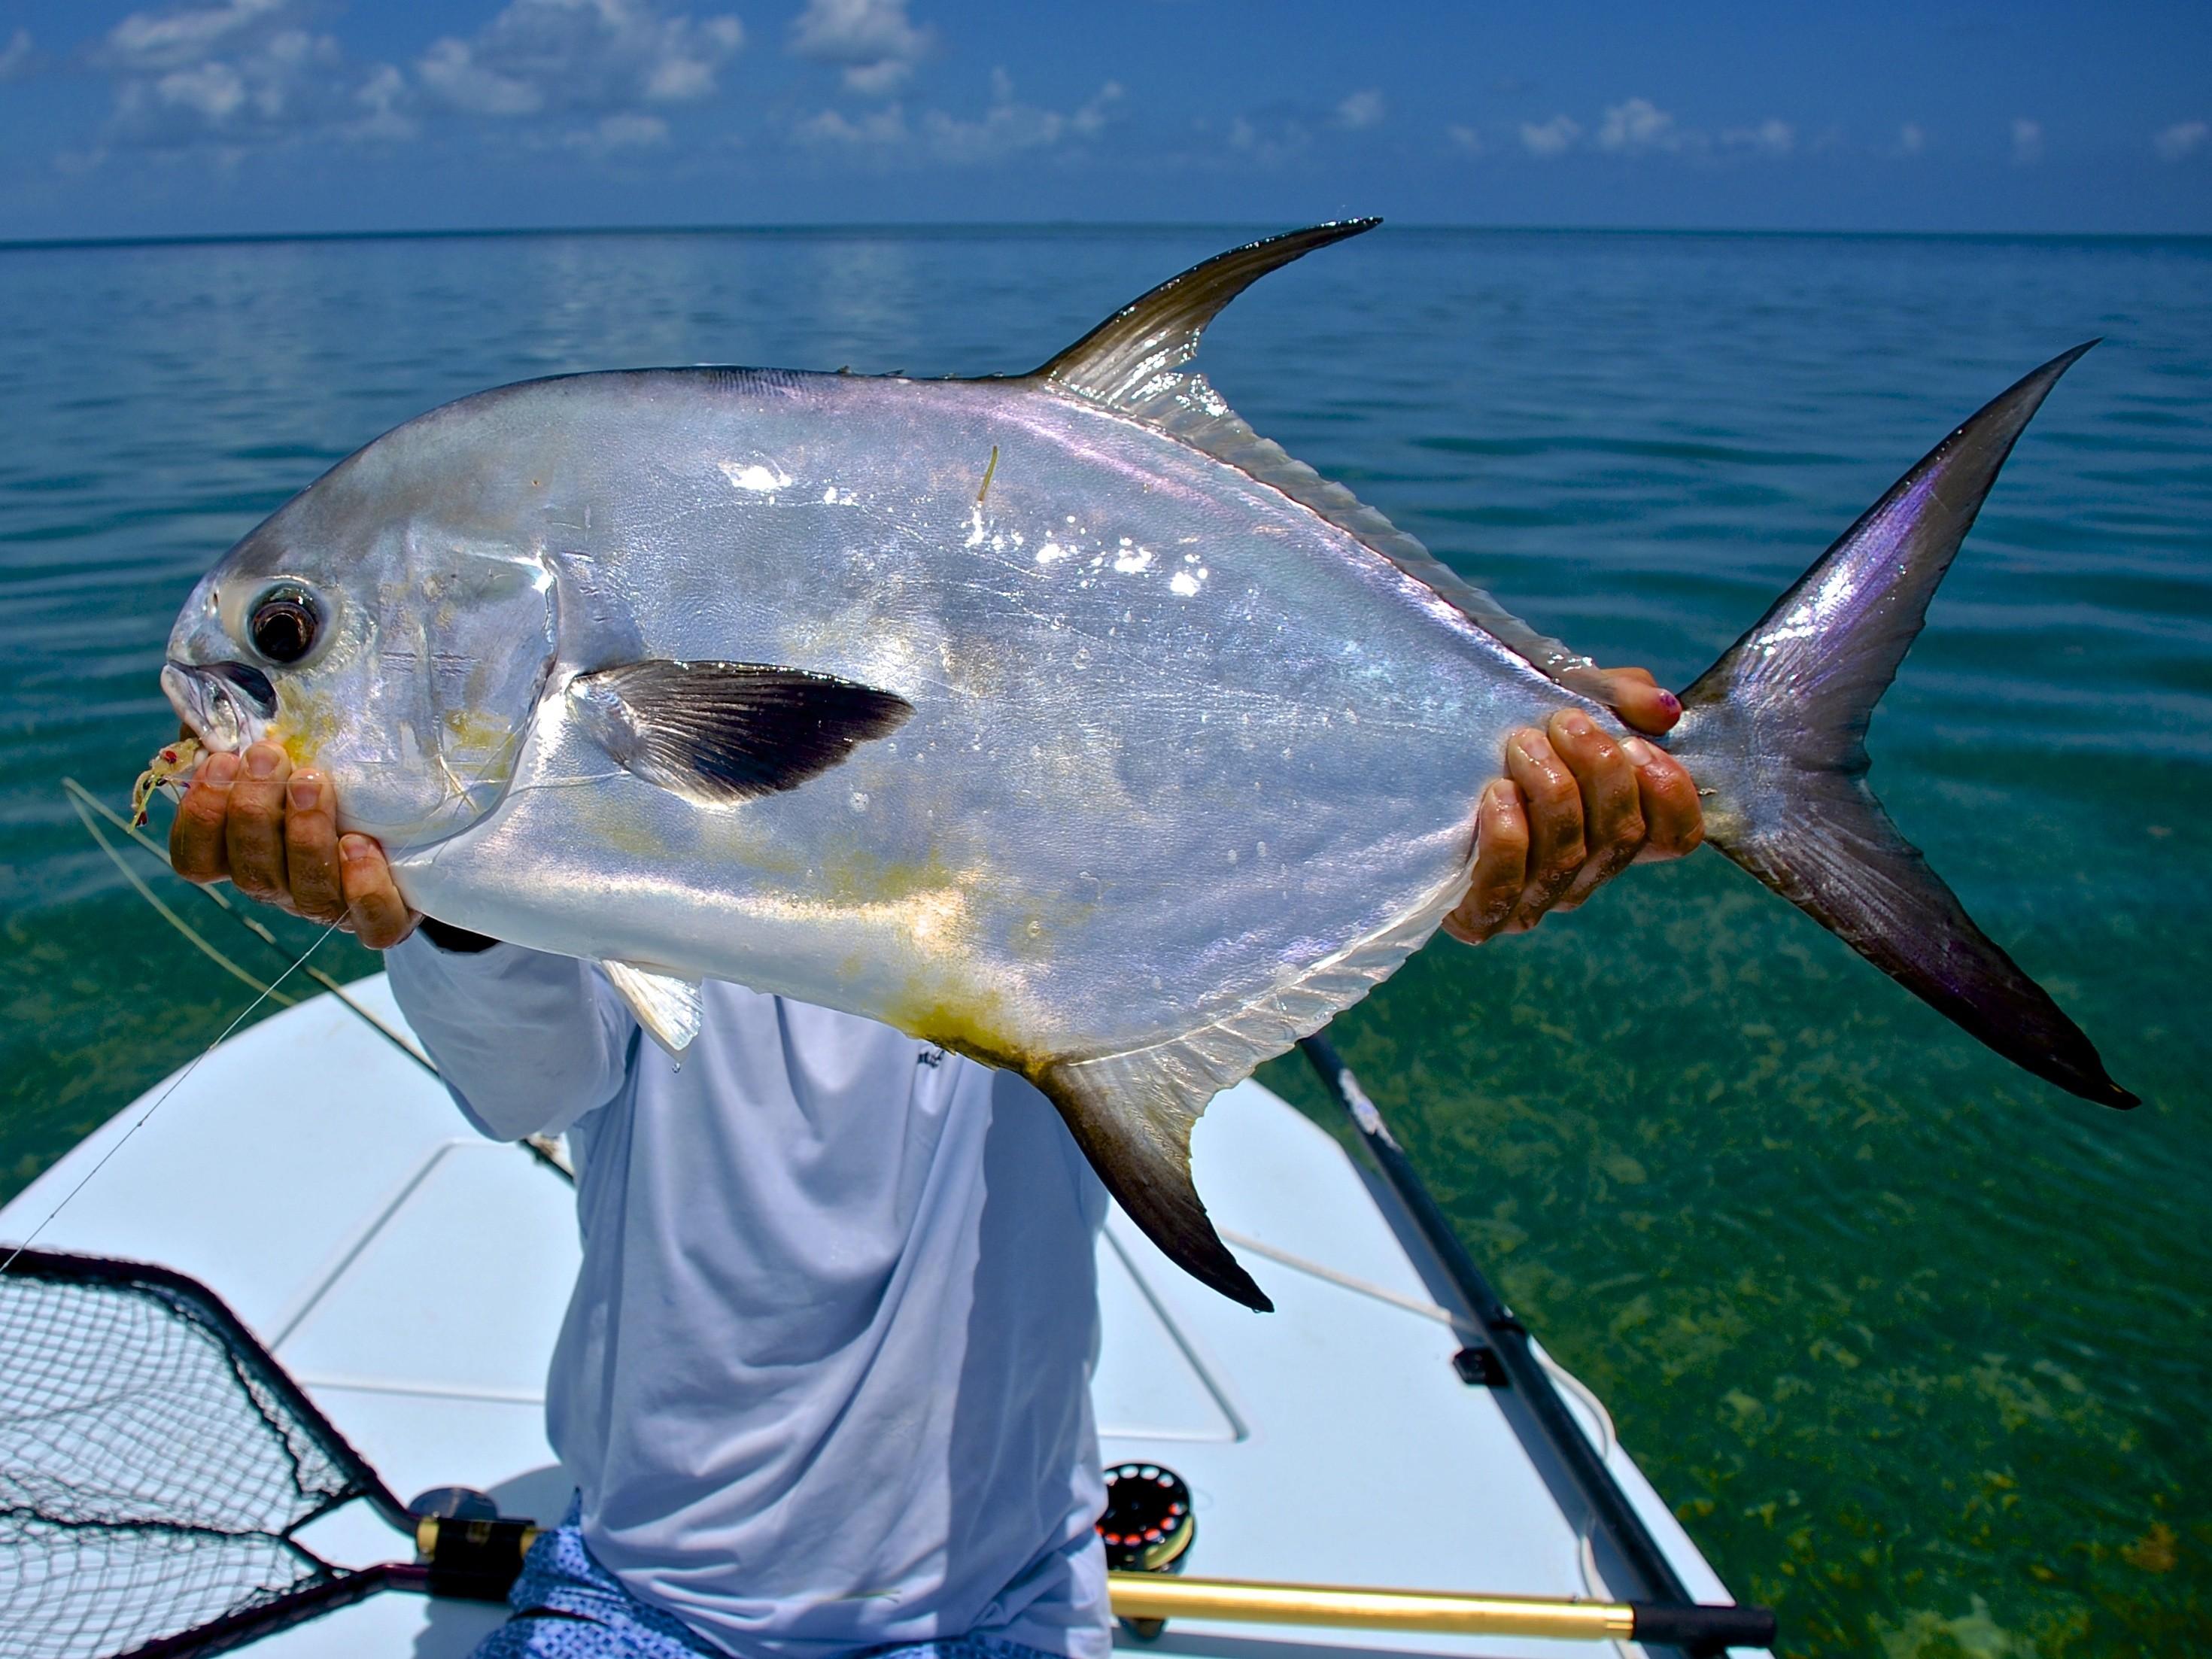 A Fishing Guide. Llc: Skiff Fishing Trips